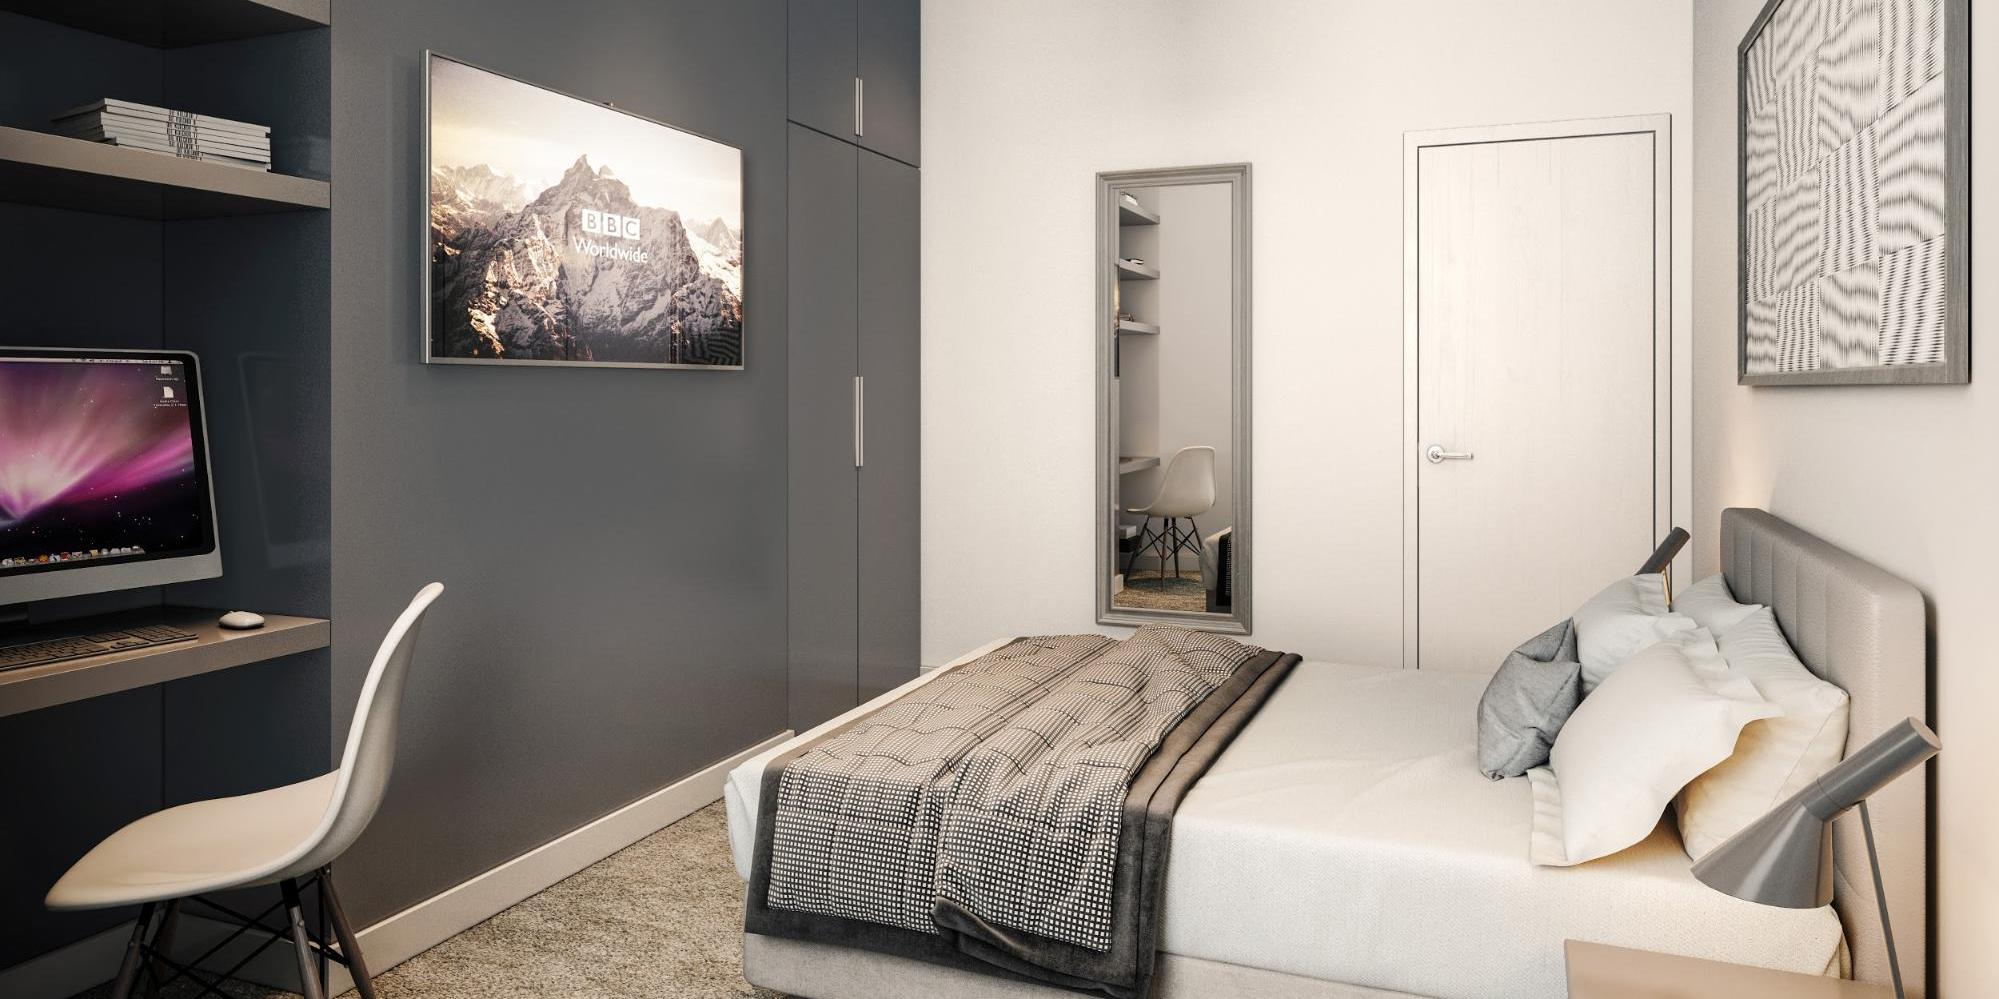 Compulsory Room Standards